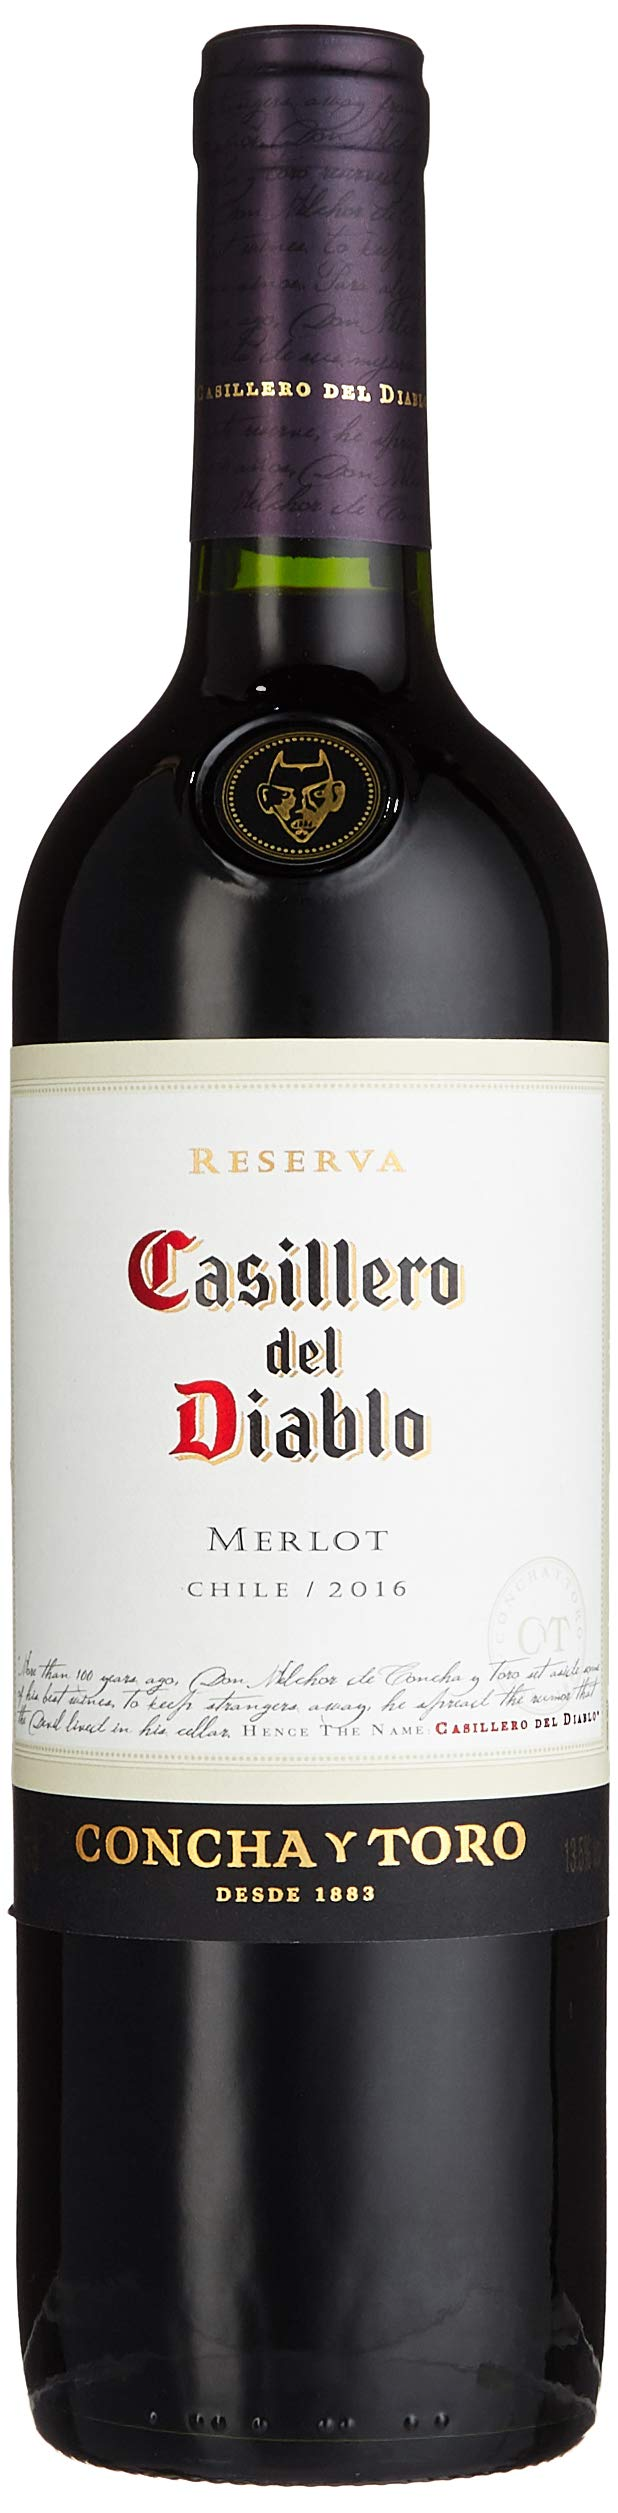 Concha-y-Toro-Casillero-del-Diablo-Merlot-2017-Trocken-3-x-075-l